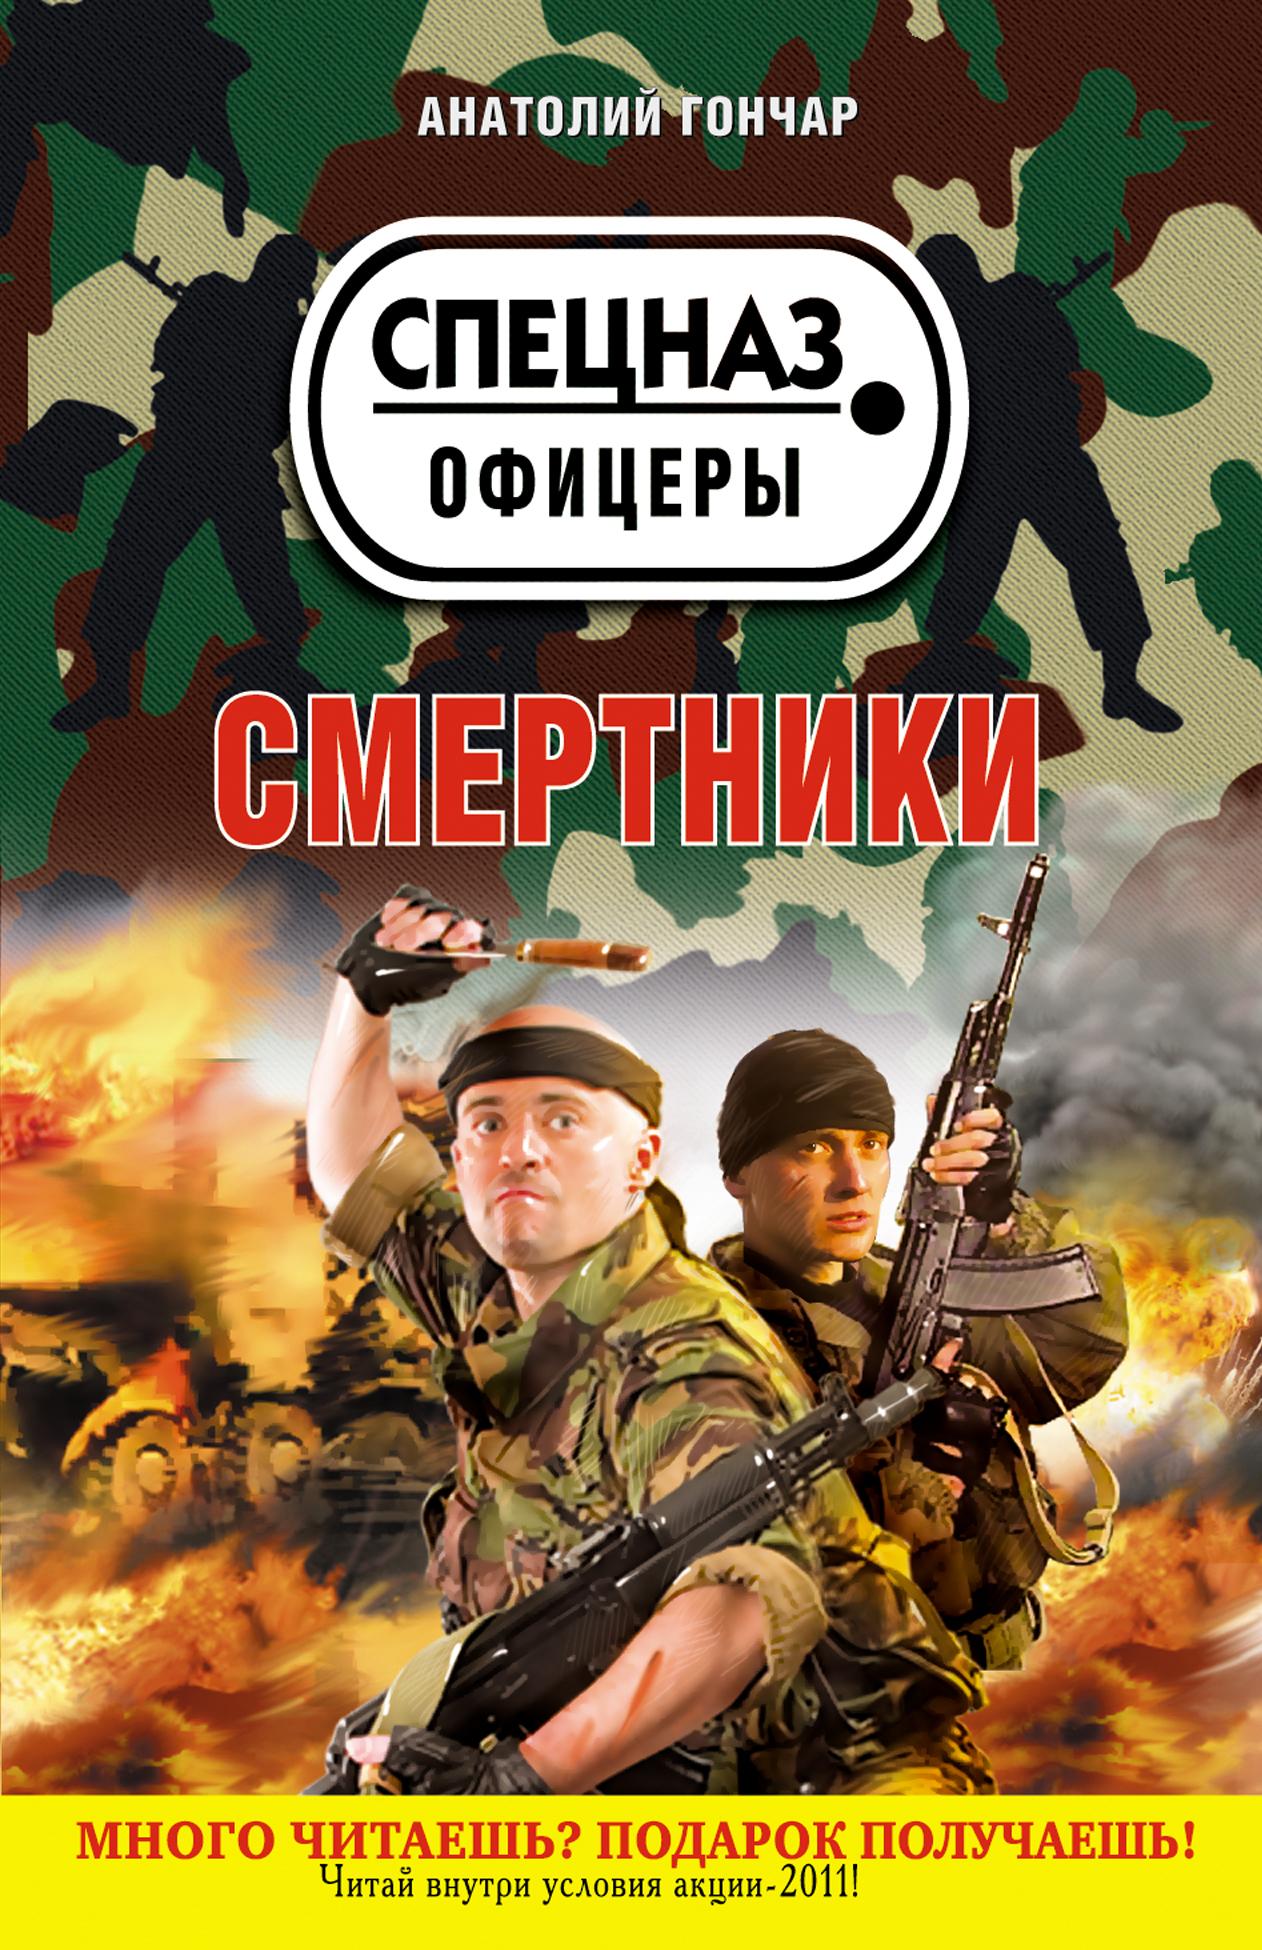 Анатолий Гончар Смертники